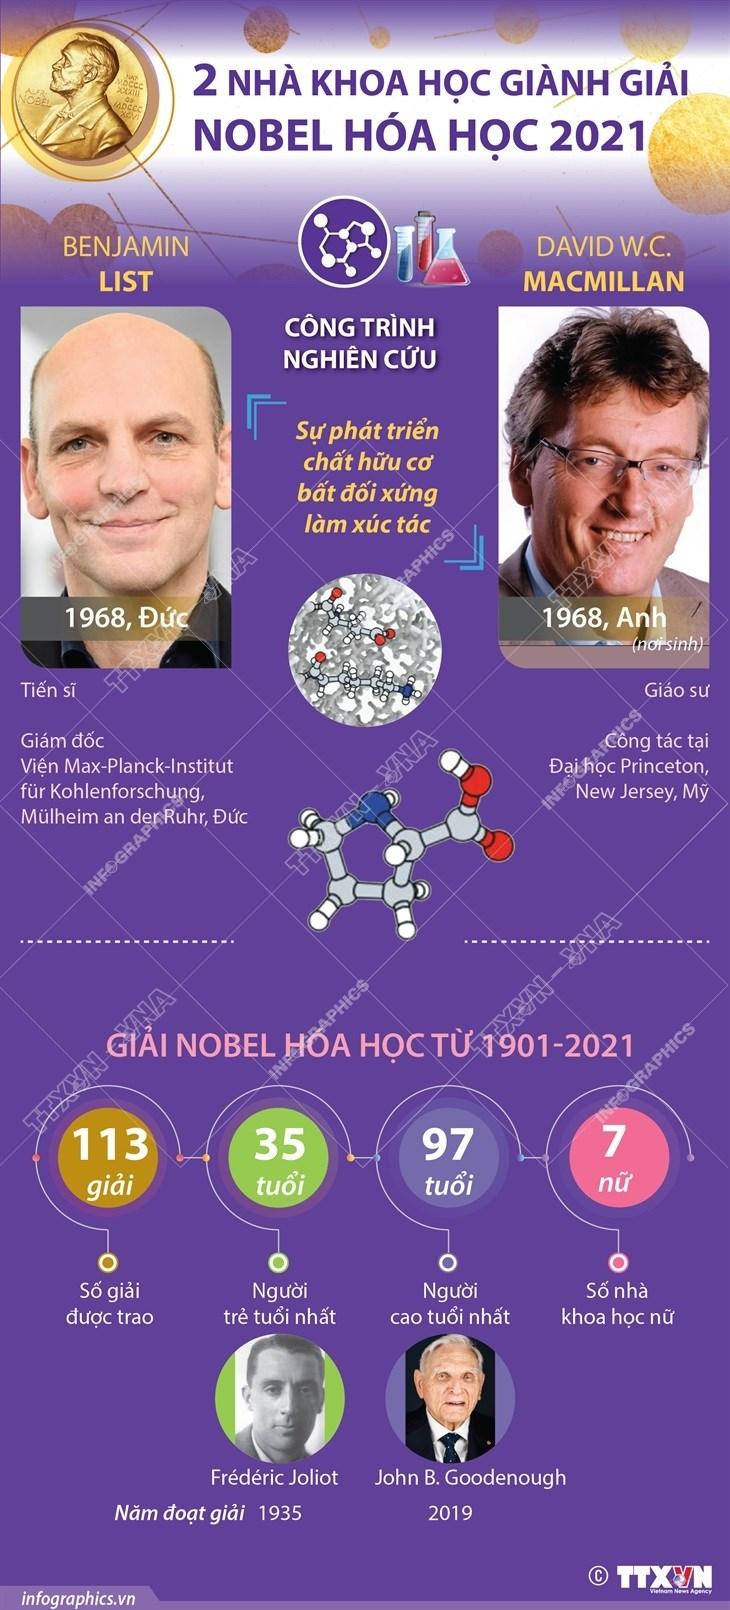 Nobel Hoa hoc vinh danh nha khoa hoc Benjamin List, David MacMillan hinh anh 1